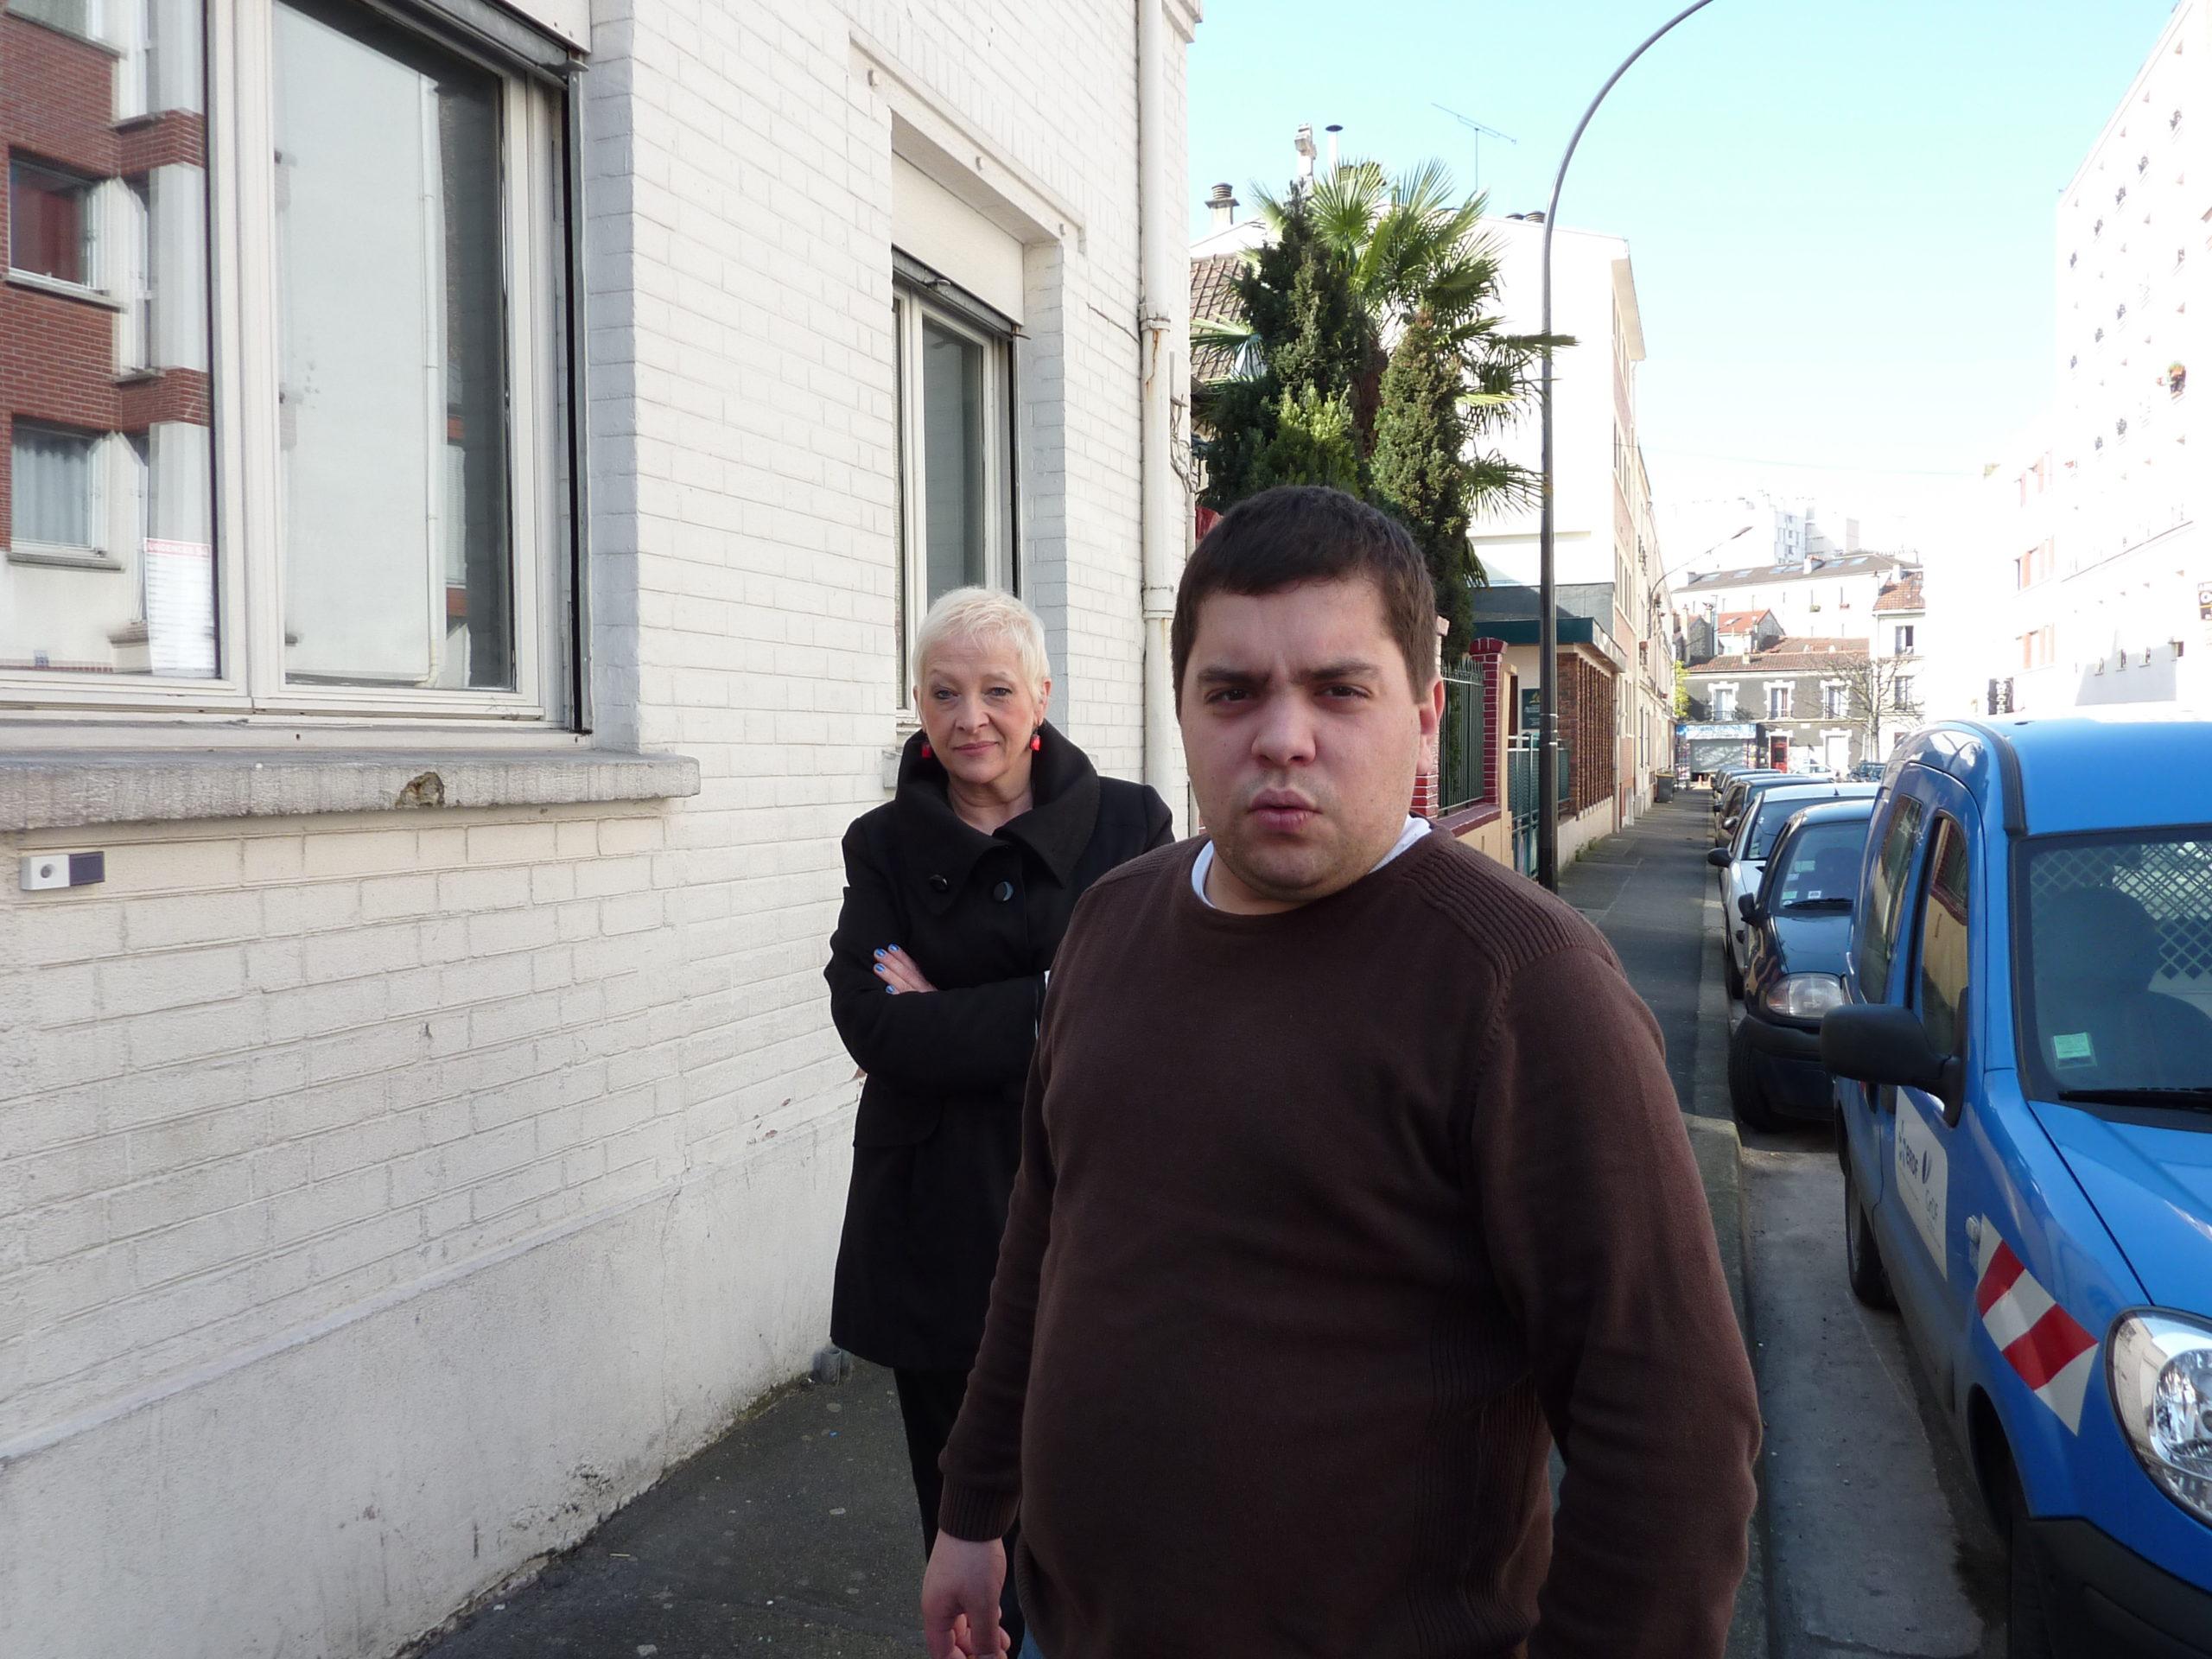 Nathalie & Patrick